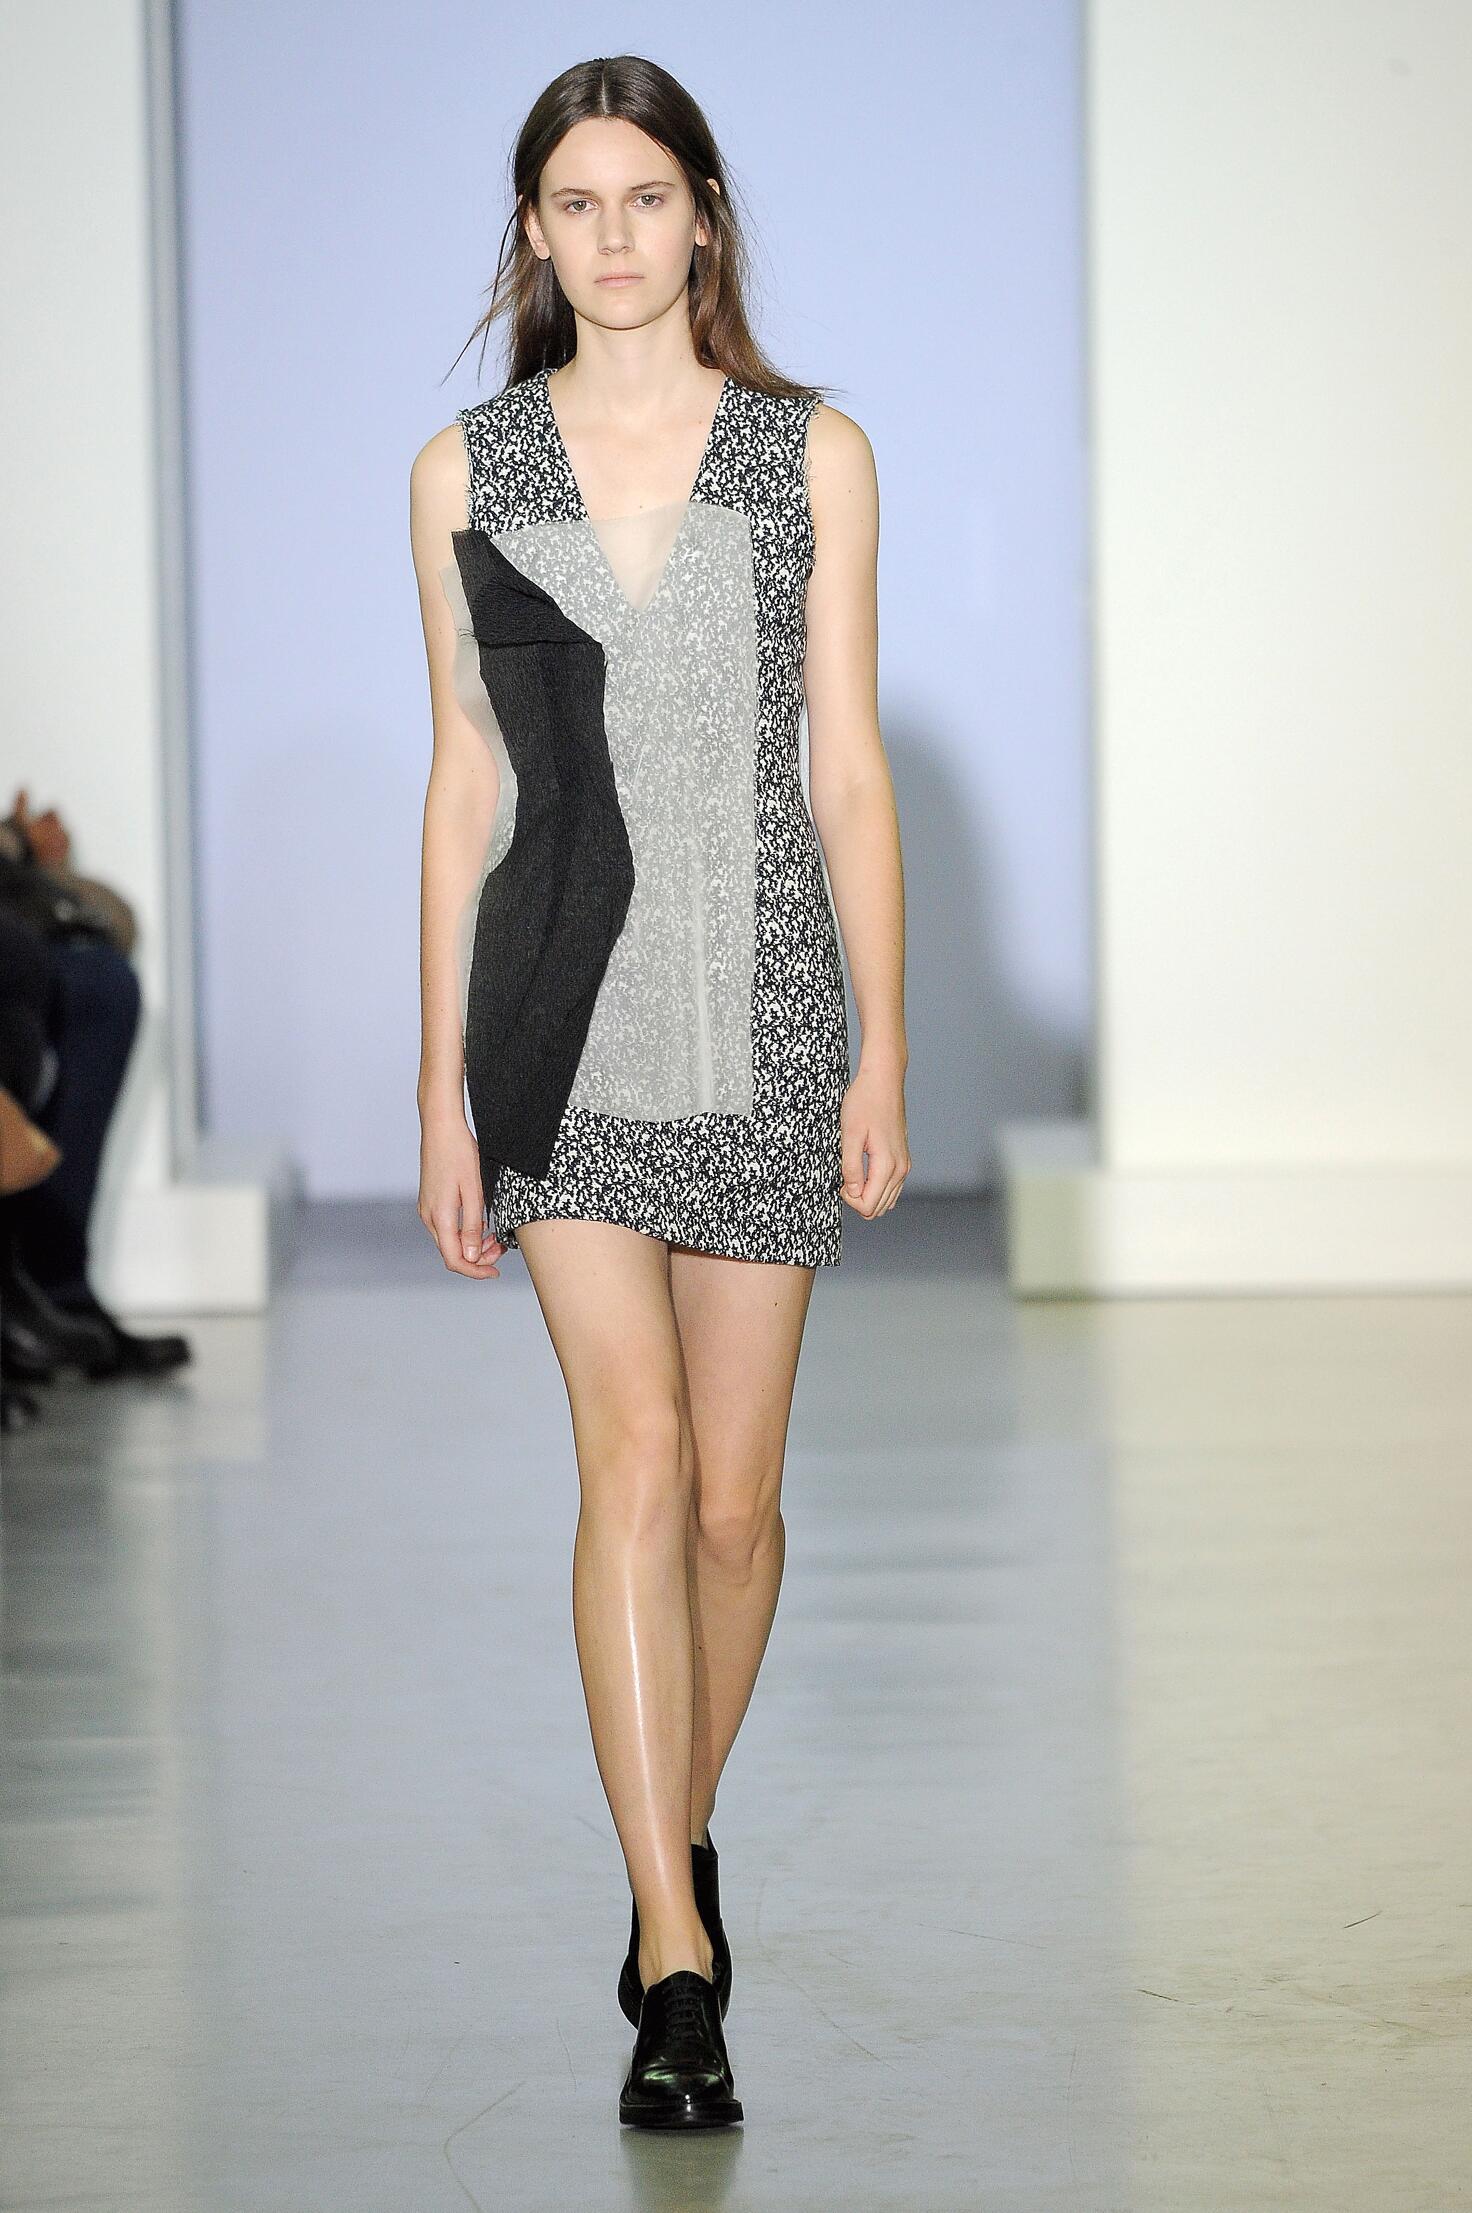 Fashion Model Yang Li Catwalk